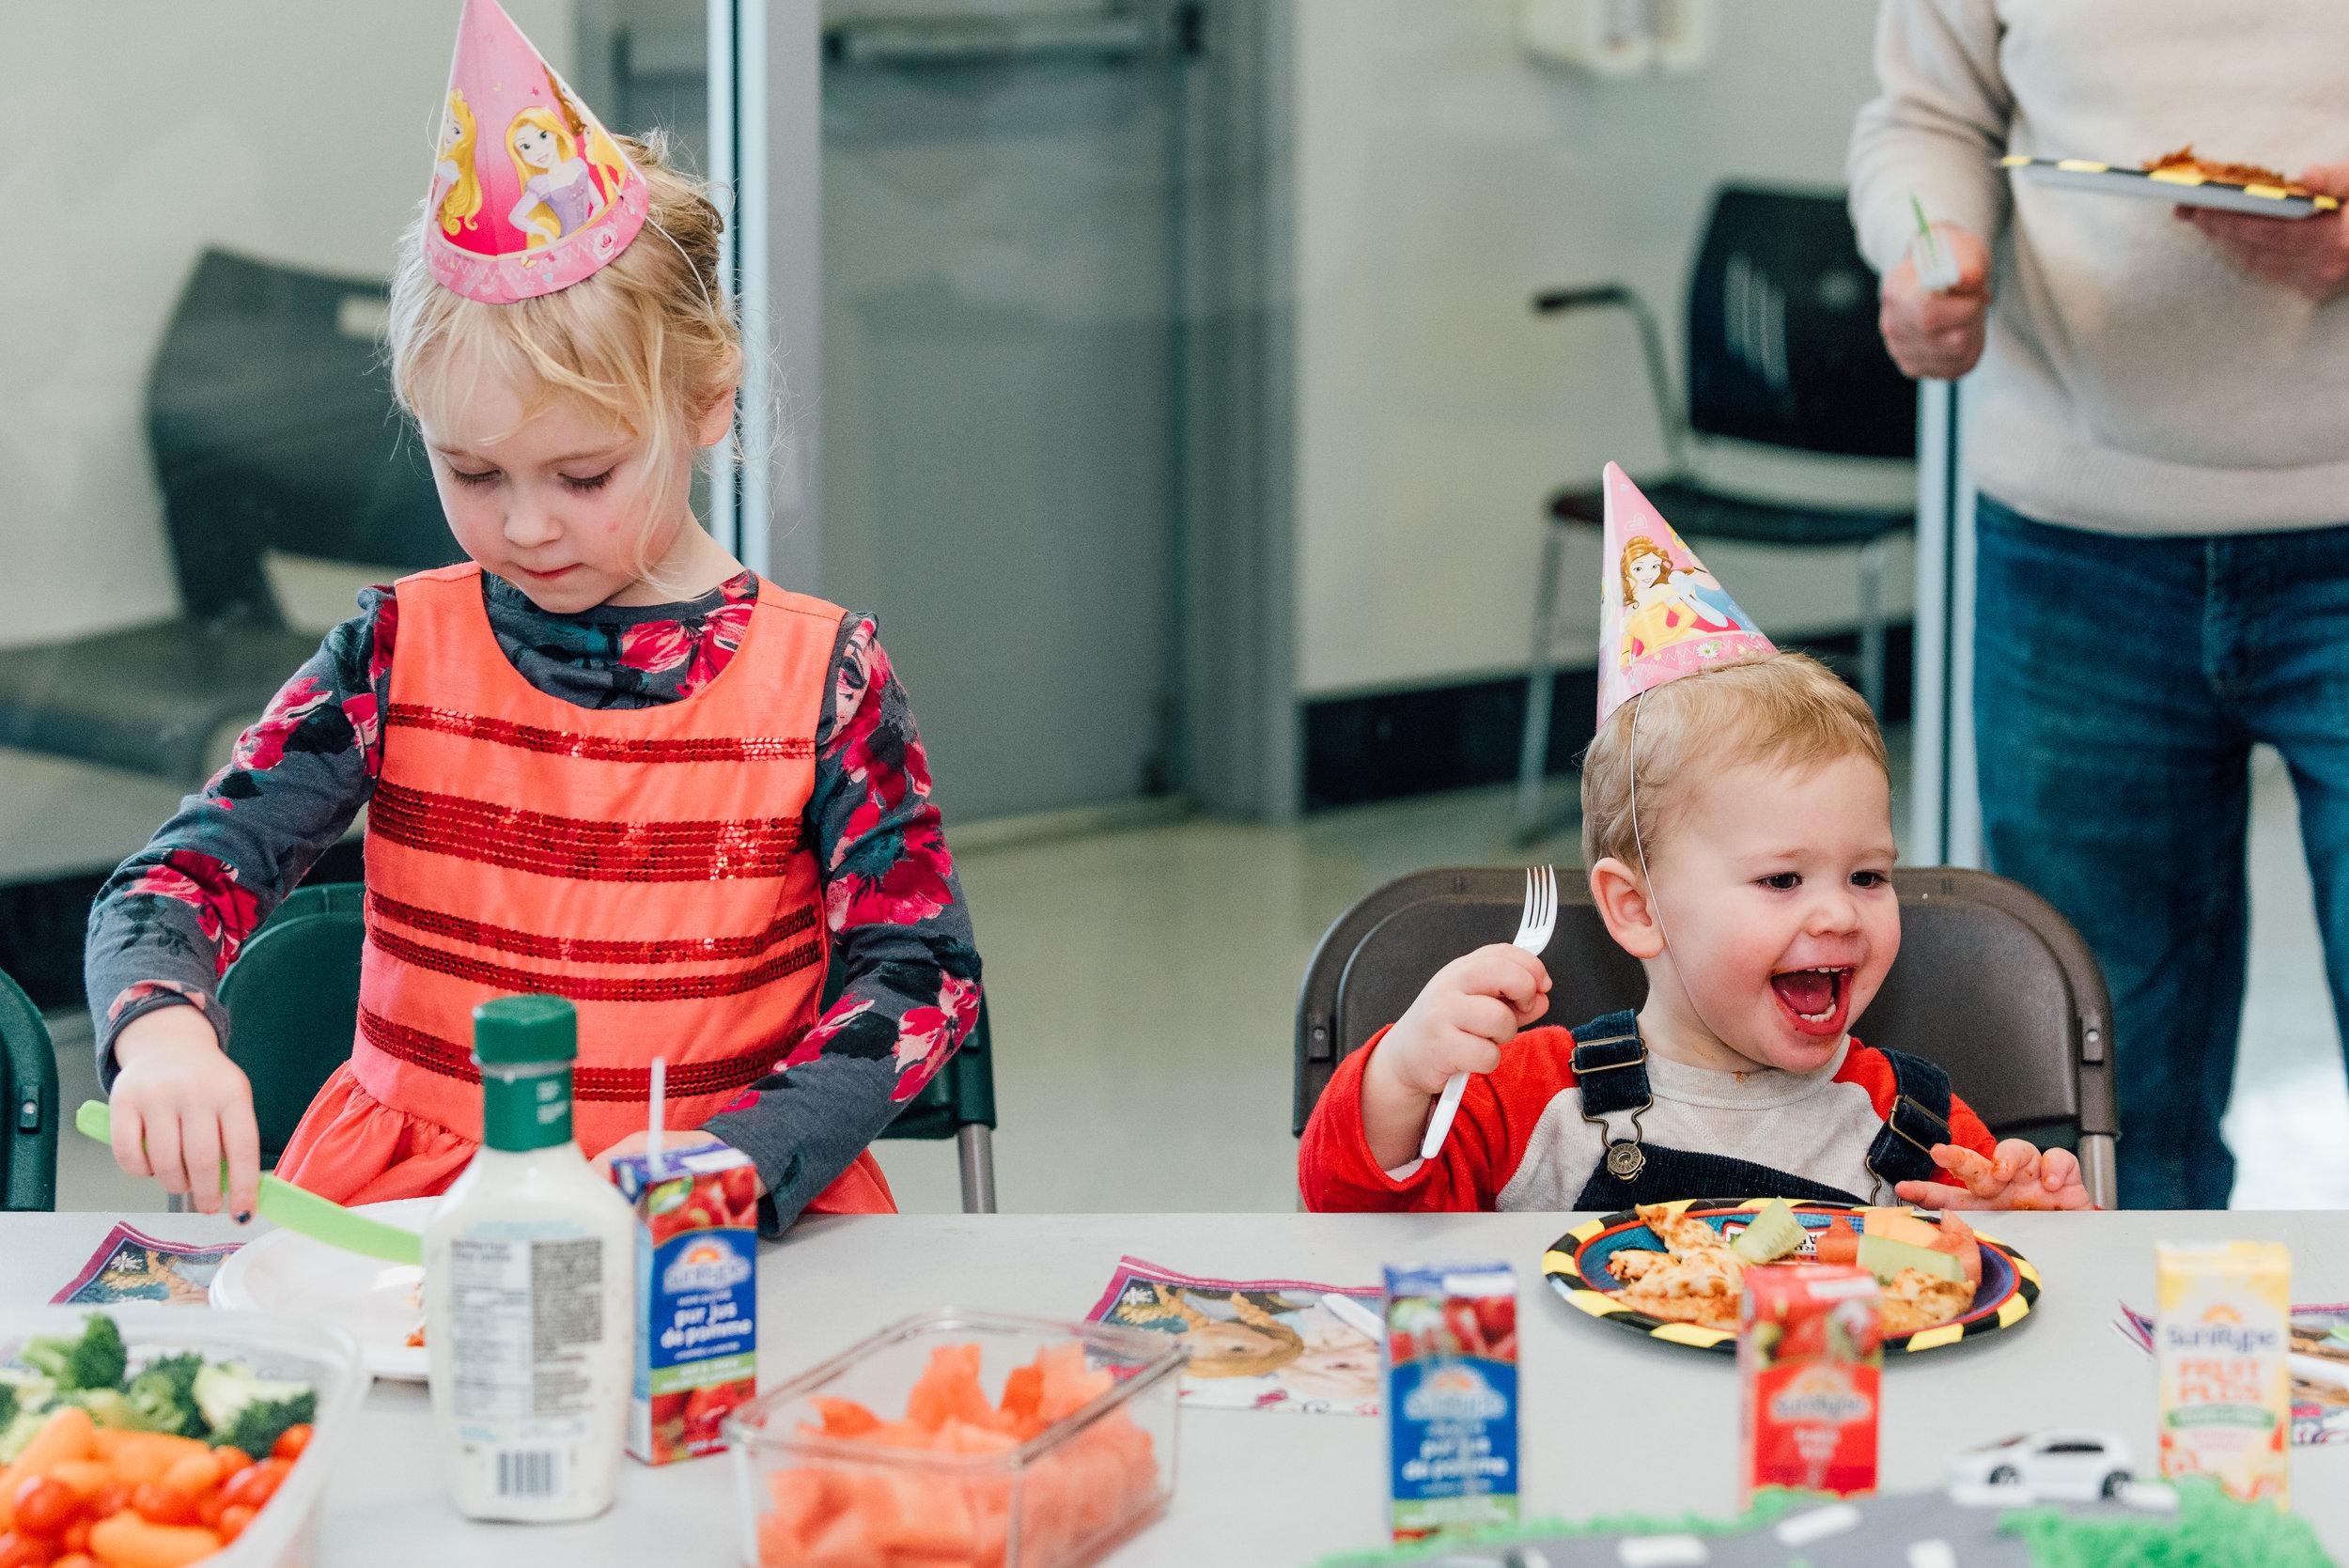 Nicola_Reiersen_Photography_Kids_Birthday_Pool_Party (26).jpg